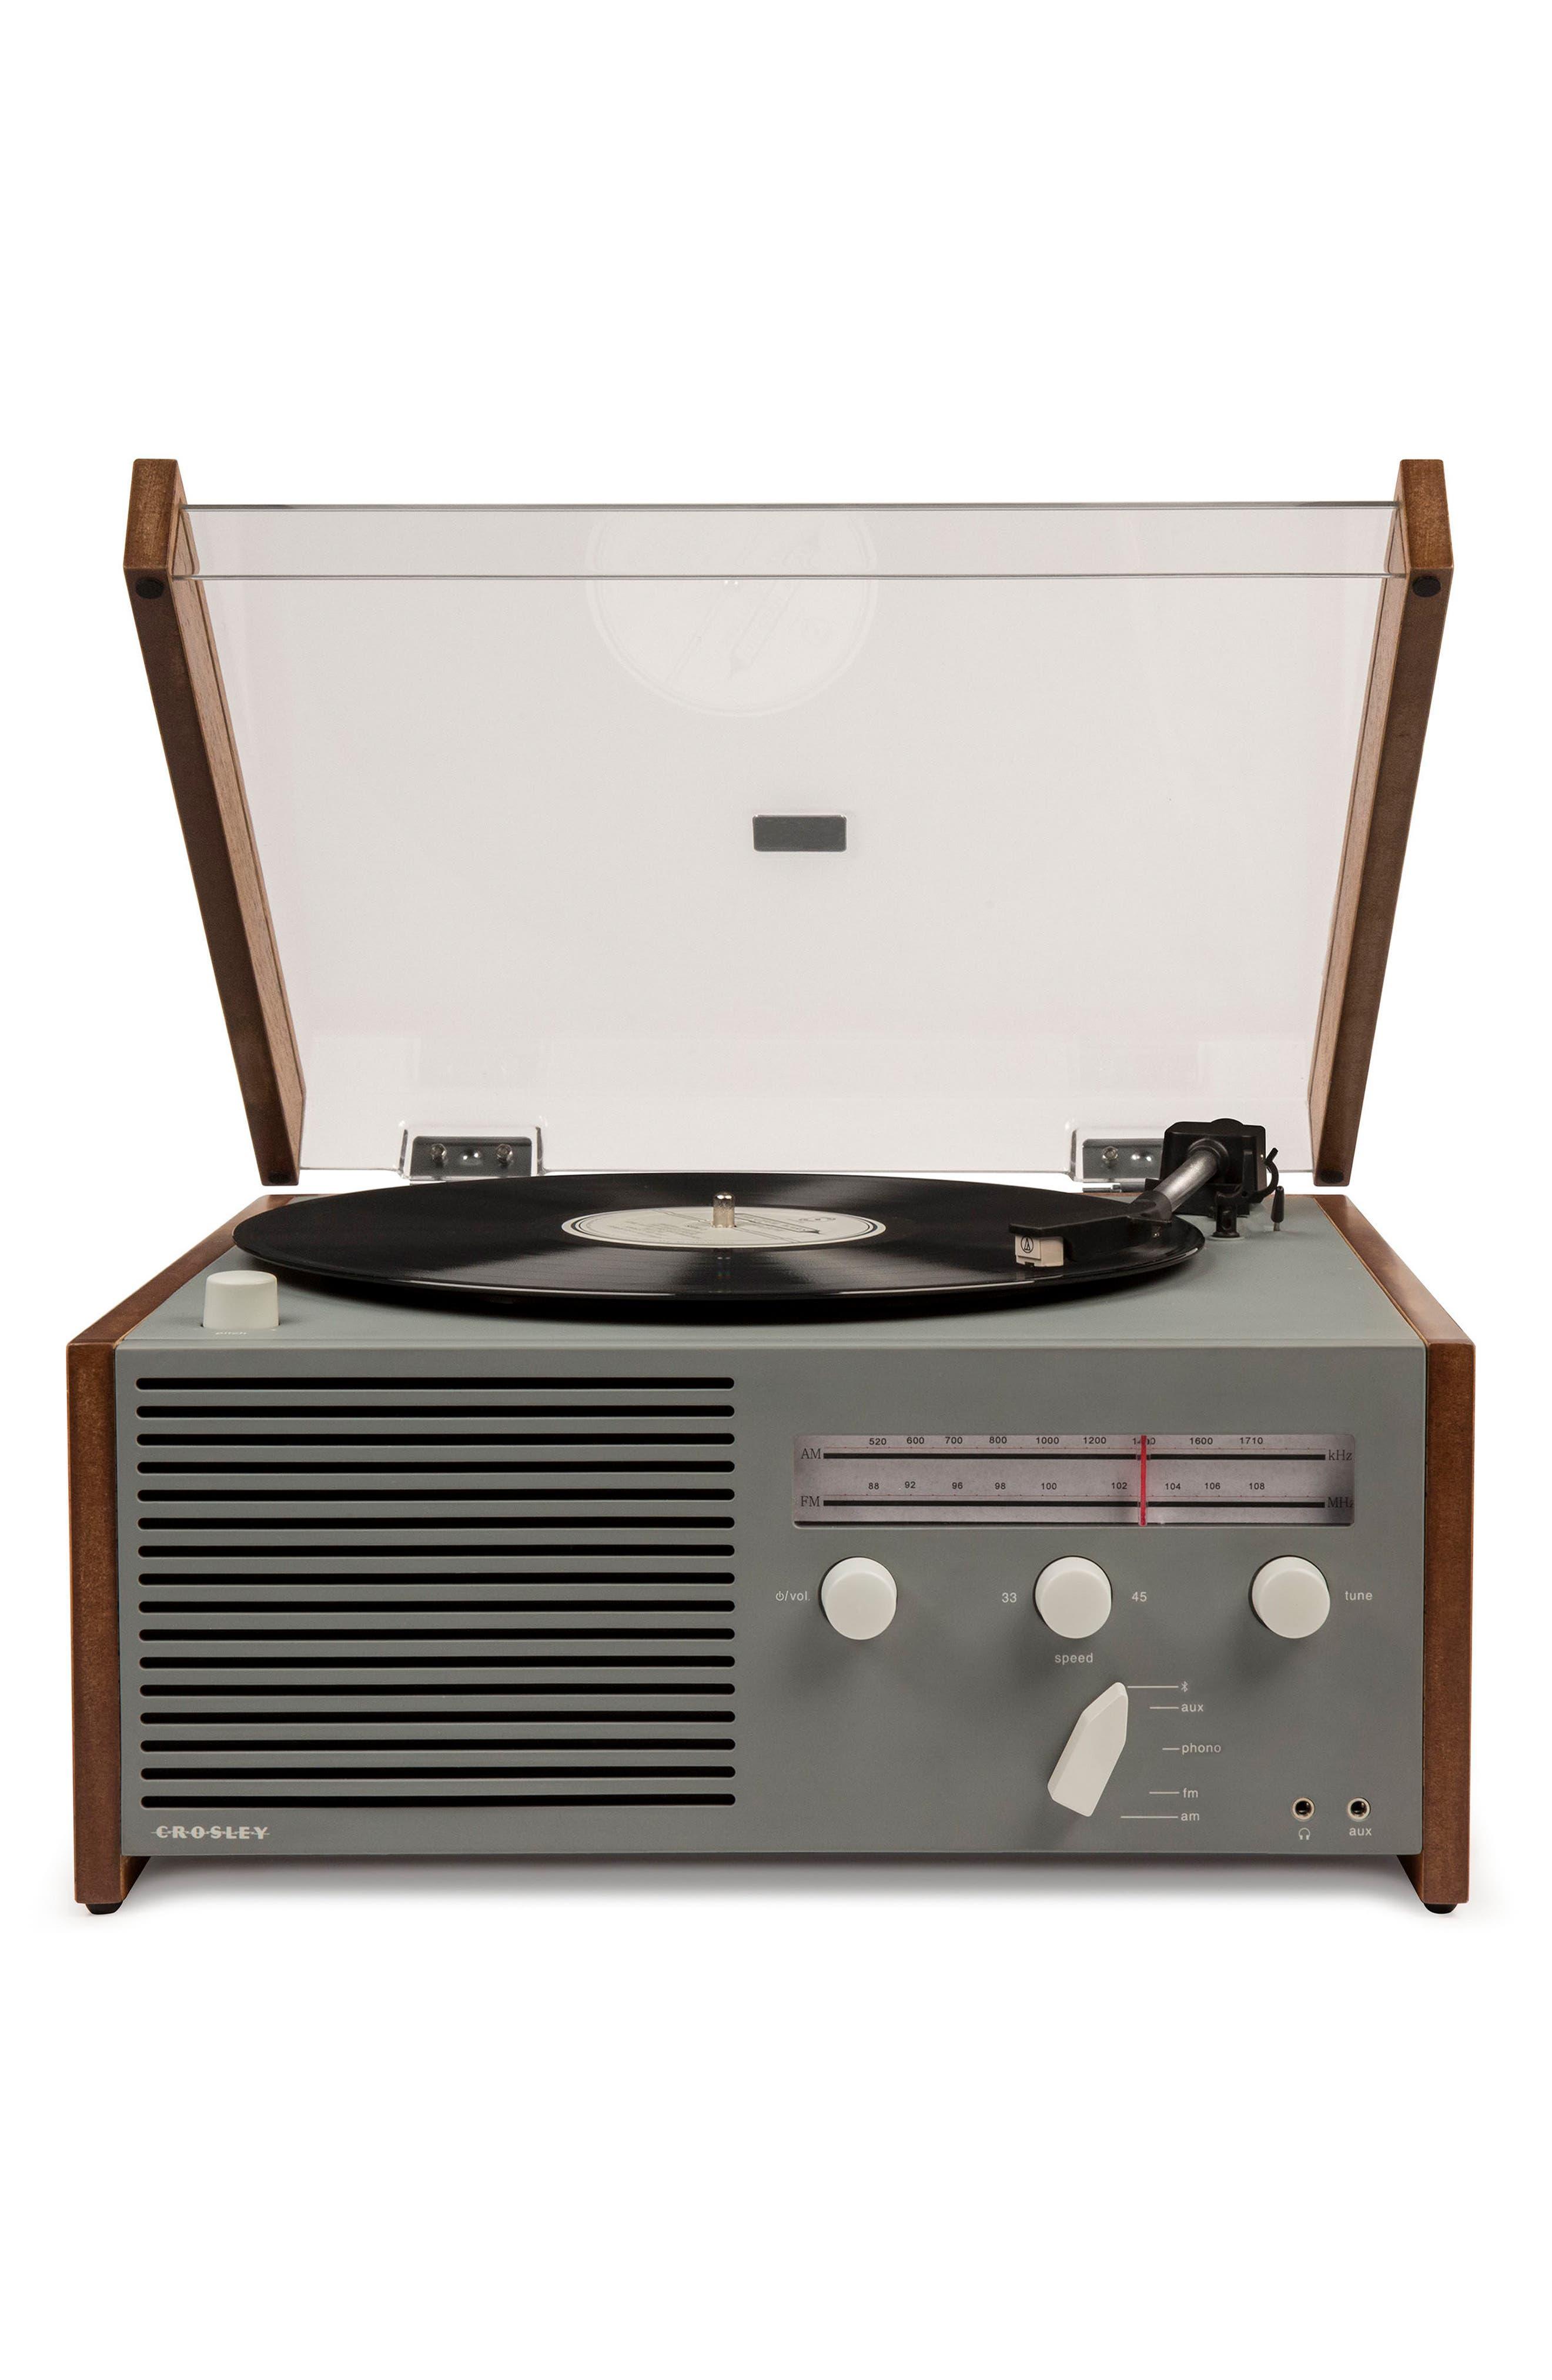 Crosley Radio Otto 4-in-1 Turntable